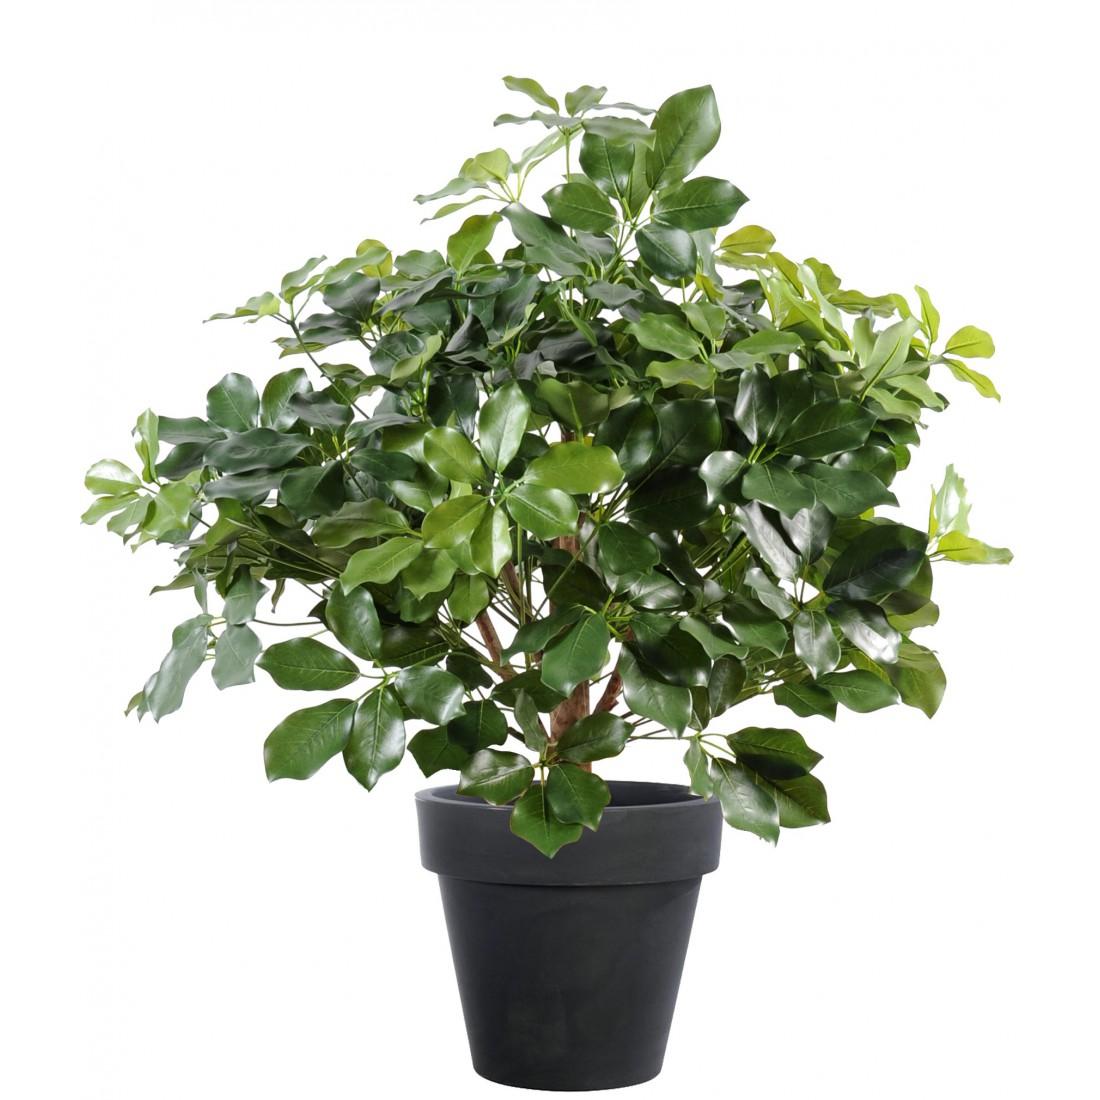 Schefflera artificiel exotica buisson 90 cm autres arbres for Buisson synthetique